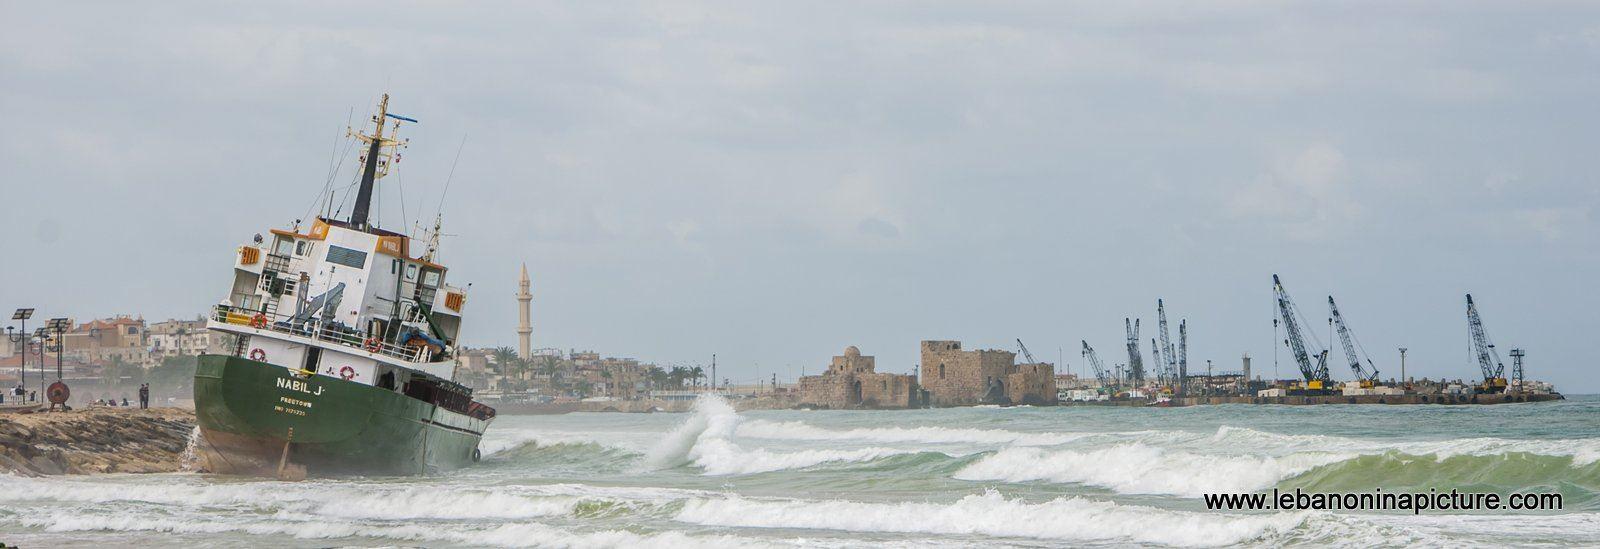 Nabil J is Stuck on Saida Beach Since April 24 - Lebanon in